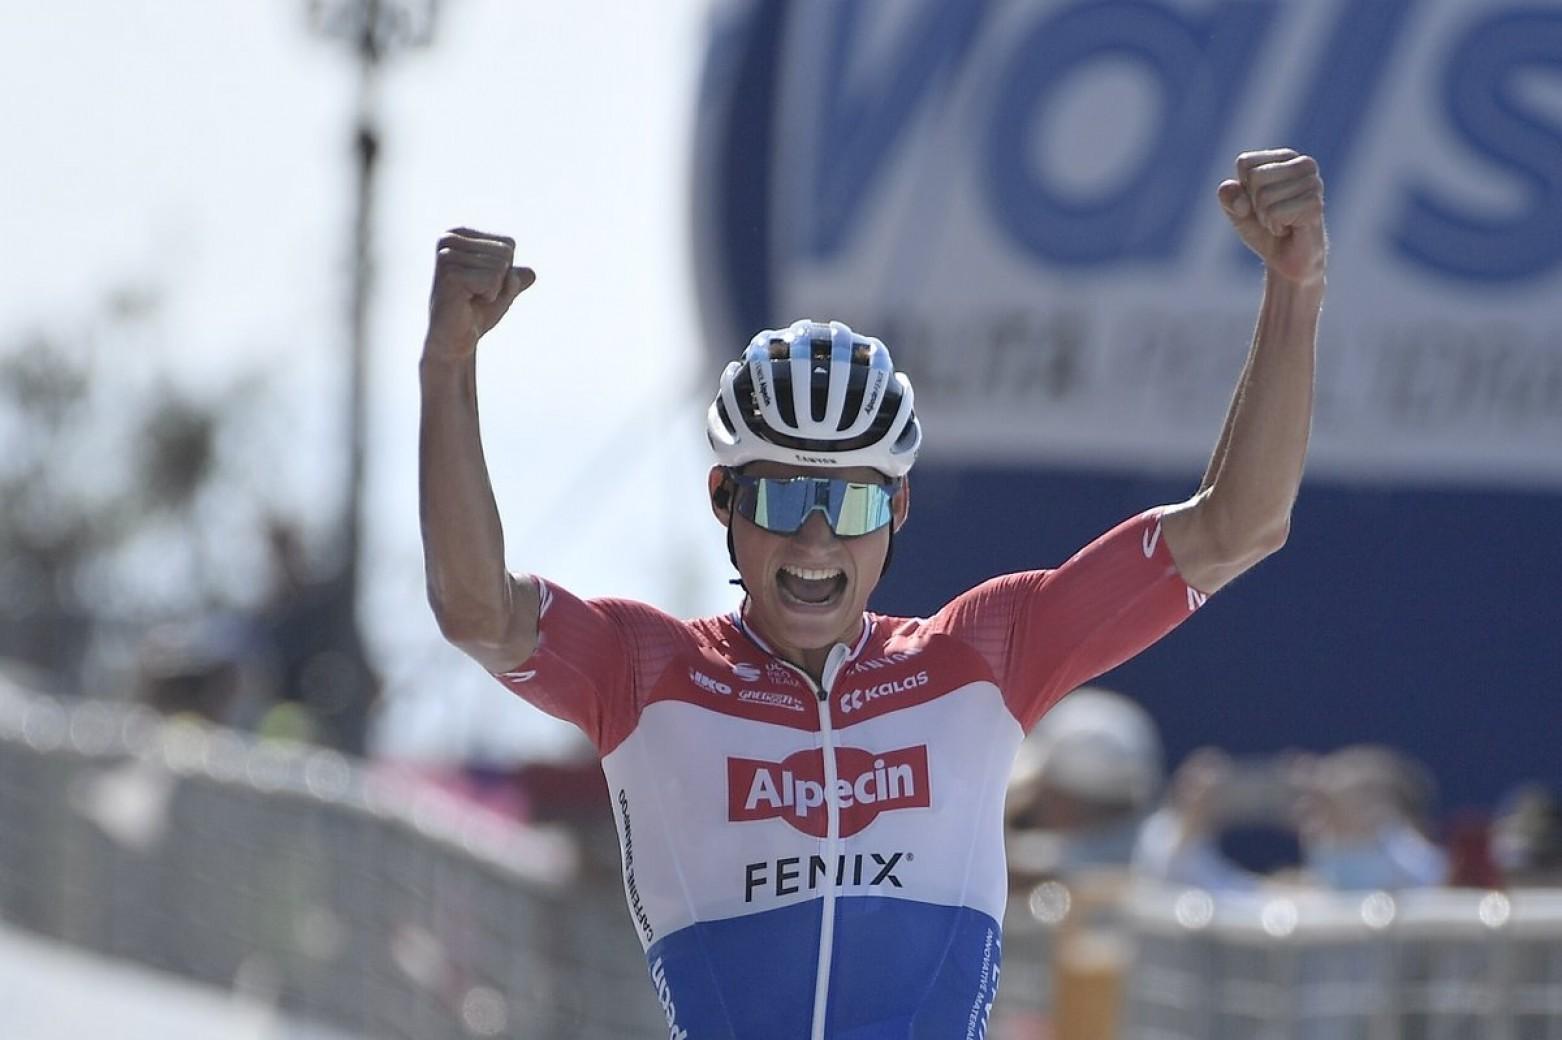 van der poel wants to win a stage of